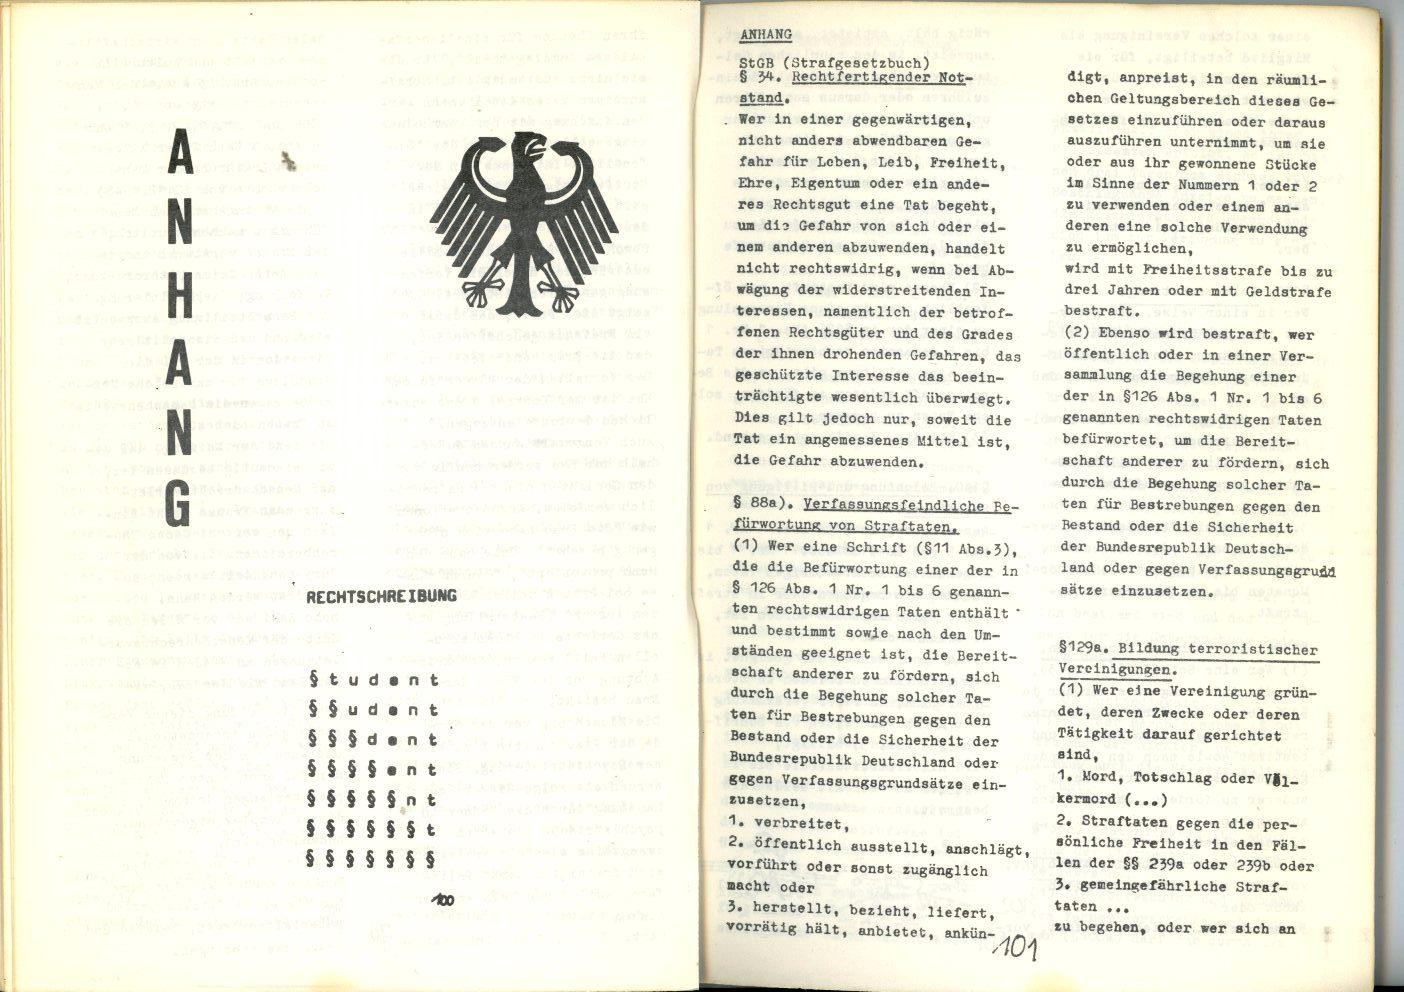 Marburg_Russell_Initiative_1978_52